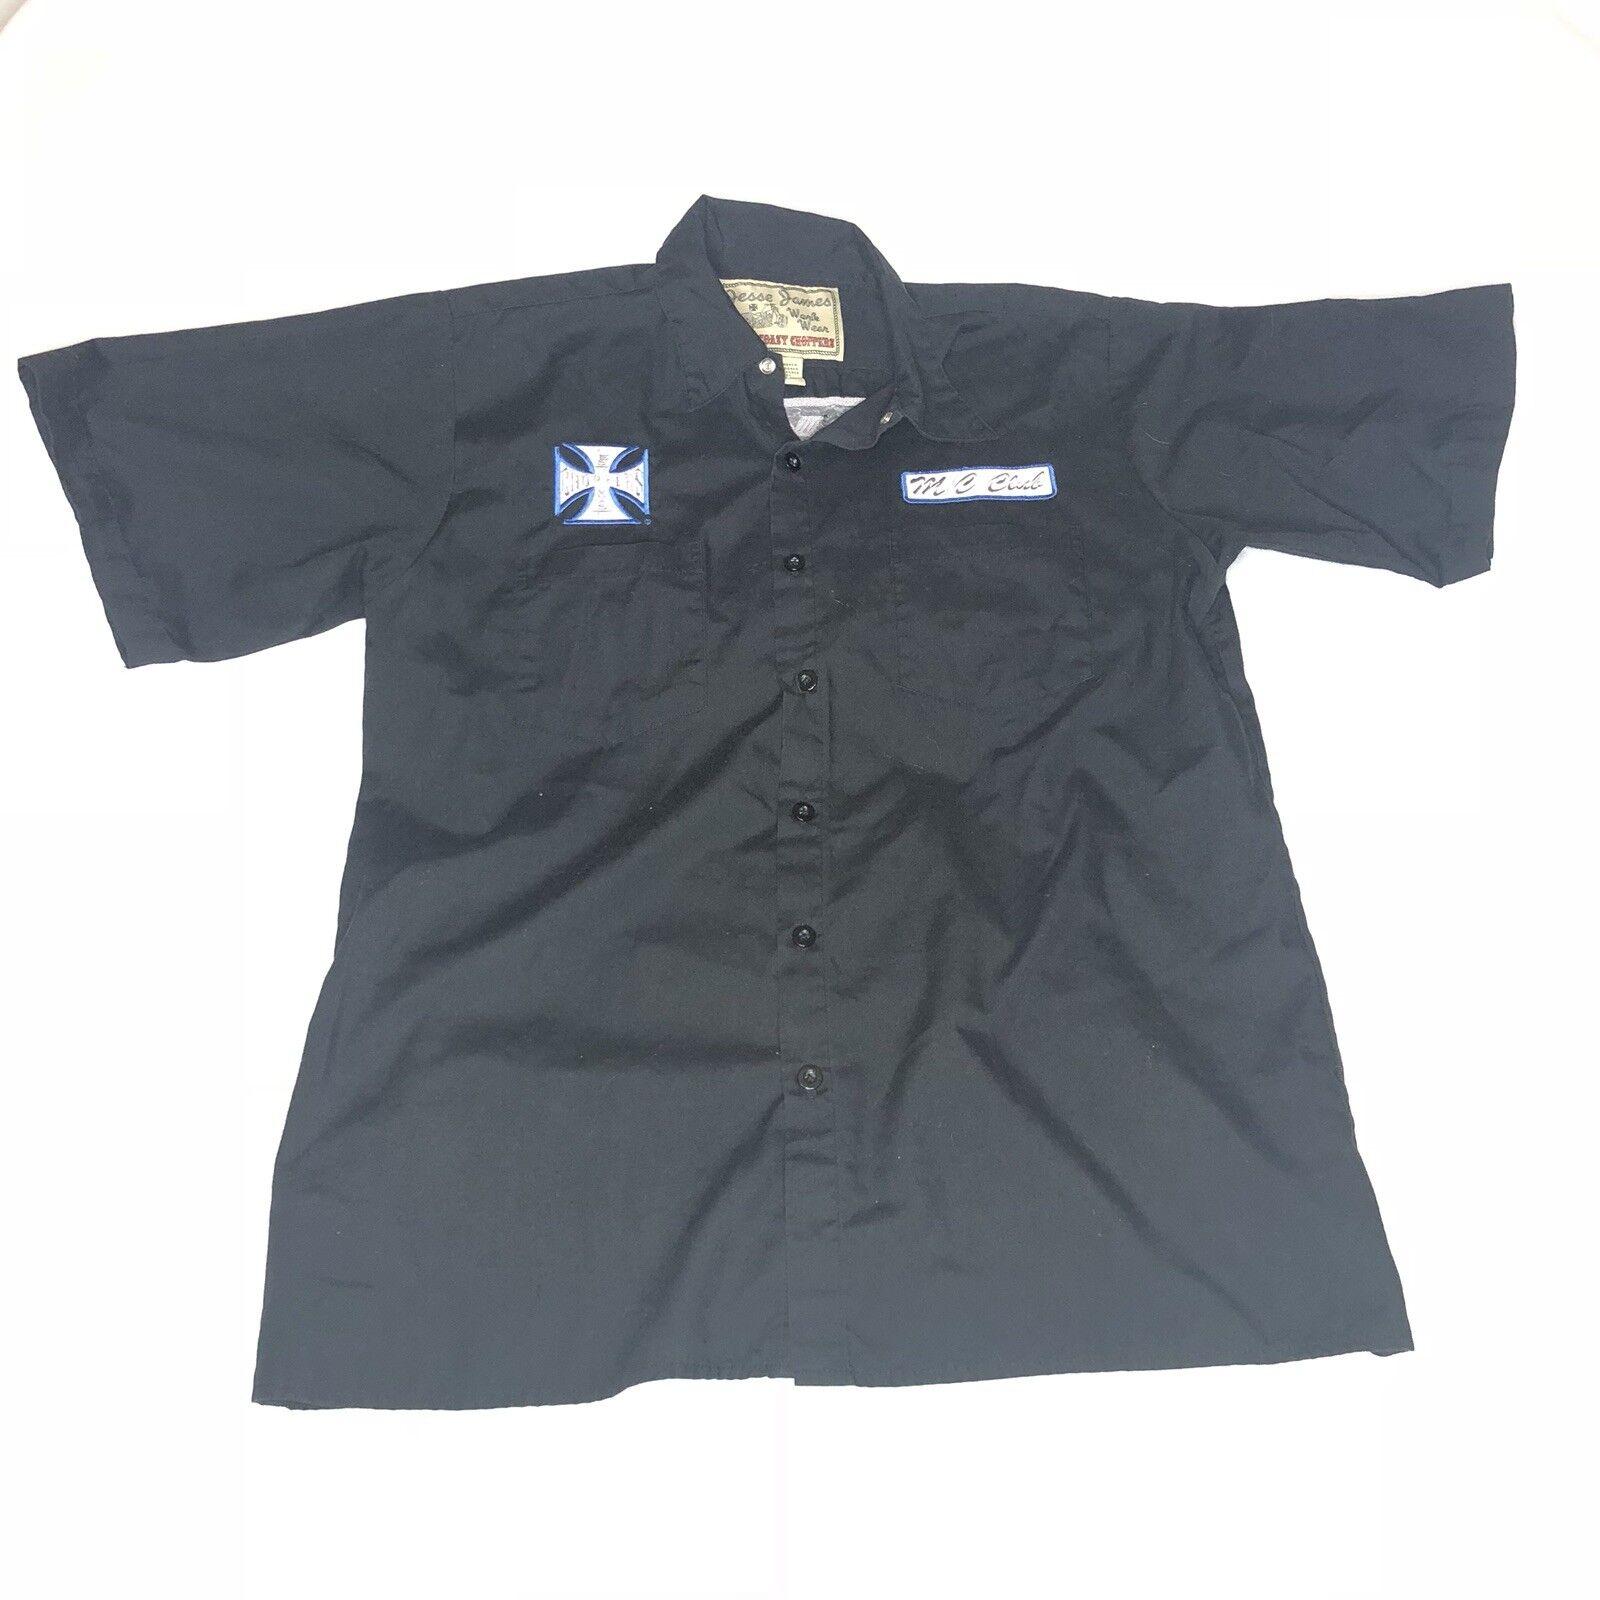 West Coast Choppers Jesse James Work Wear Button Blau Shop Shirt  Herren Medium